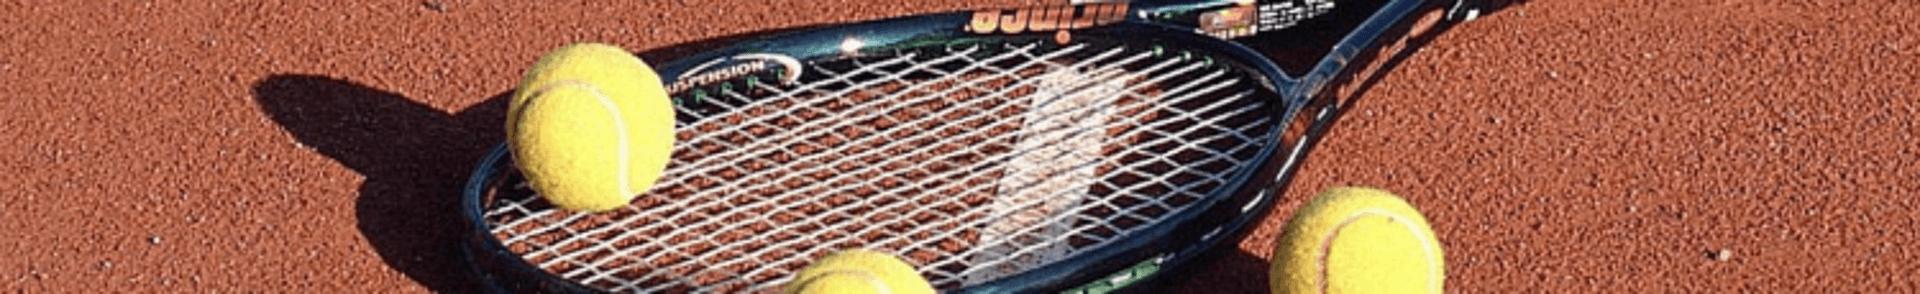 07-tennis-1920x294px-v4